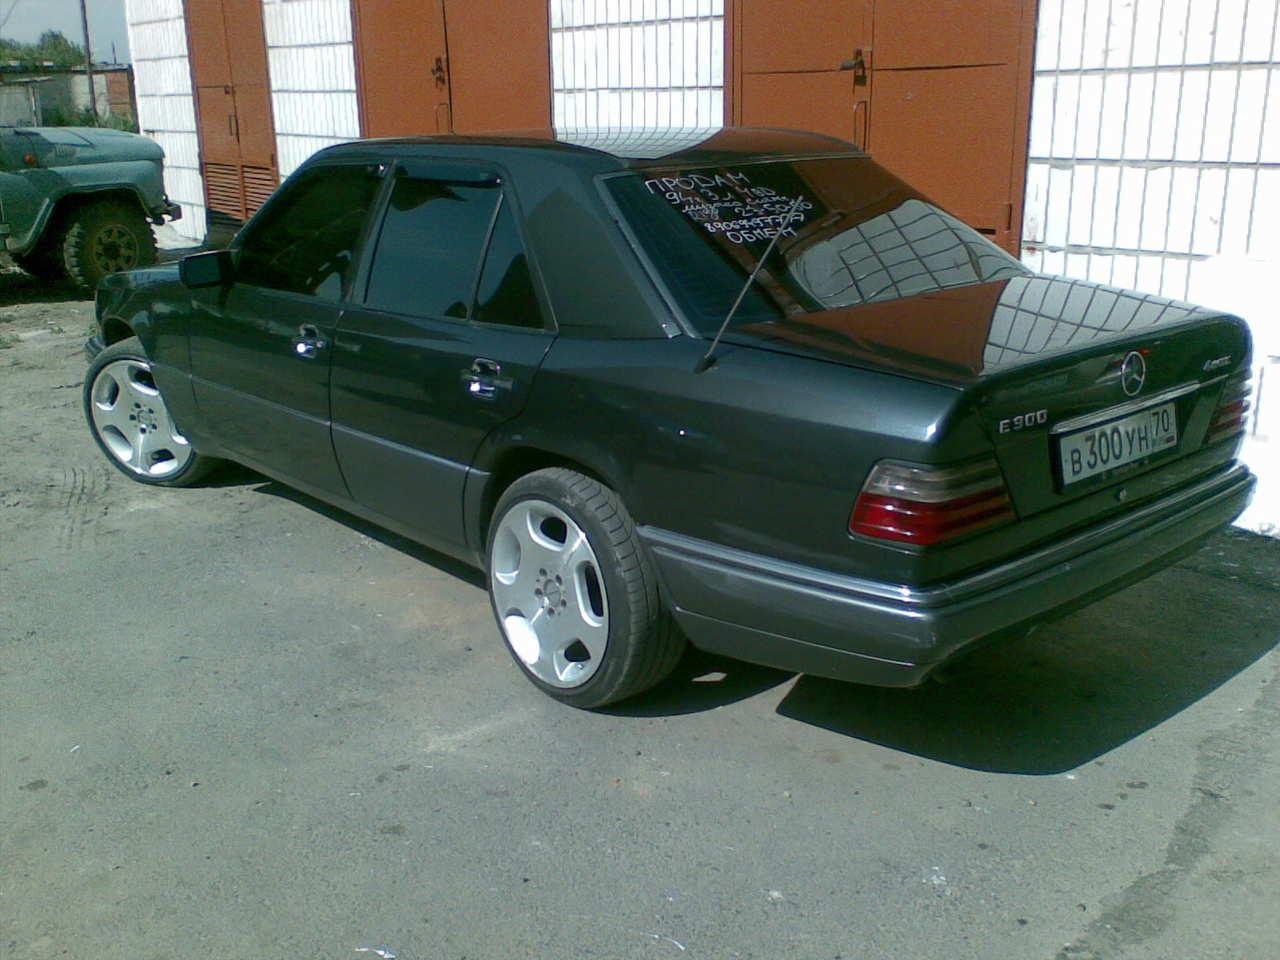 Used 1994 mercedes benz e class photos 3000cc gasoline for Mercedes benz e320 1994